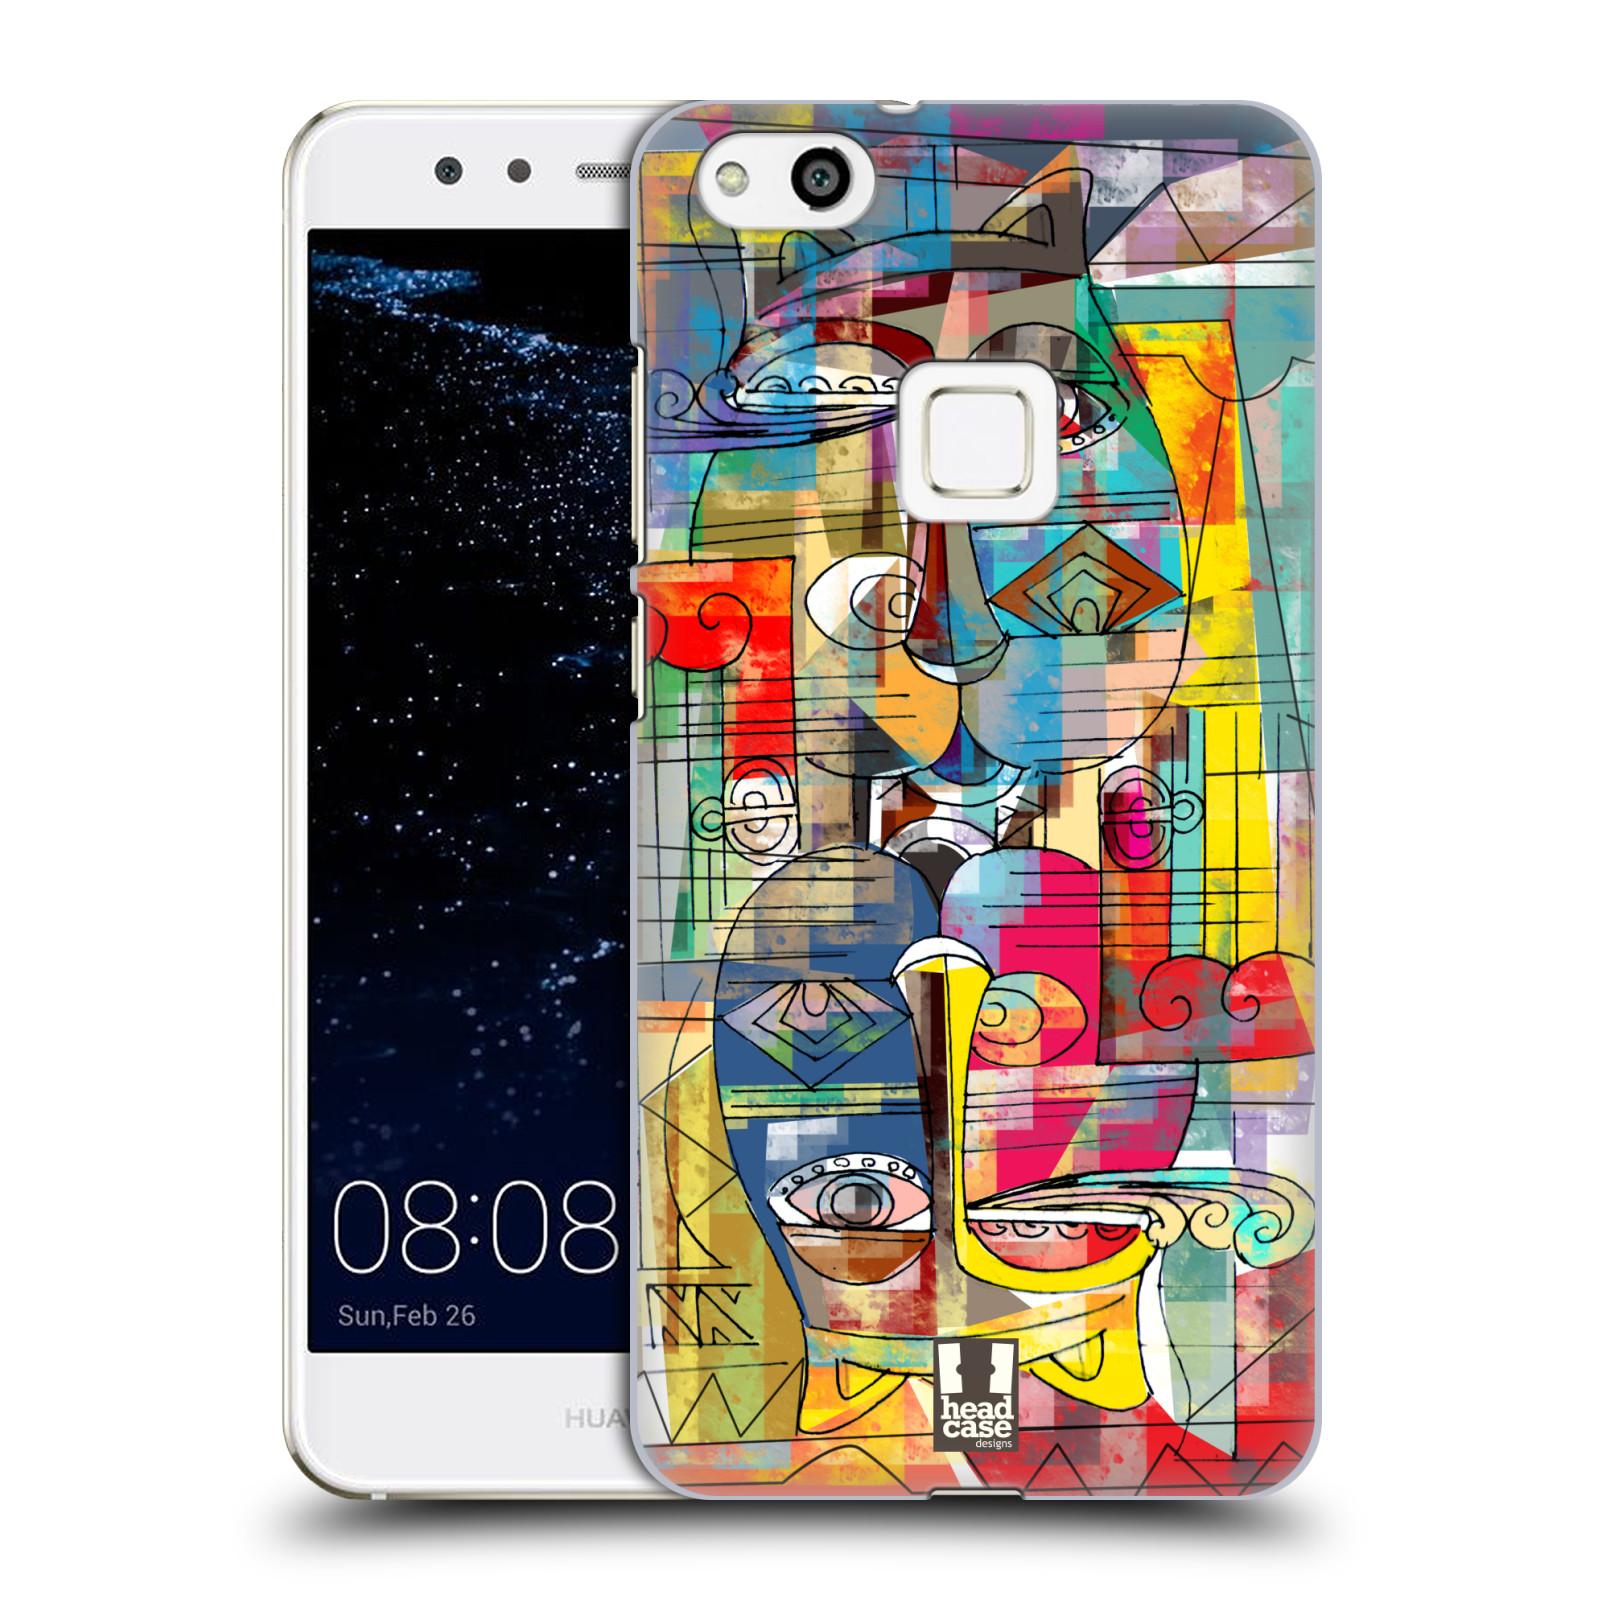 Plastové pouzdro na mobil Huawei P10 Lite Head Case - AZTEC MANX (Plastový kryt či obal na mobilní telefon Huawei P10 Lite Dual SIM (LX1/LX1A))